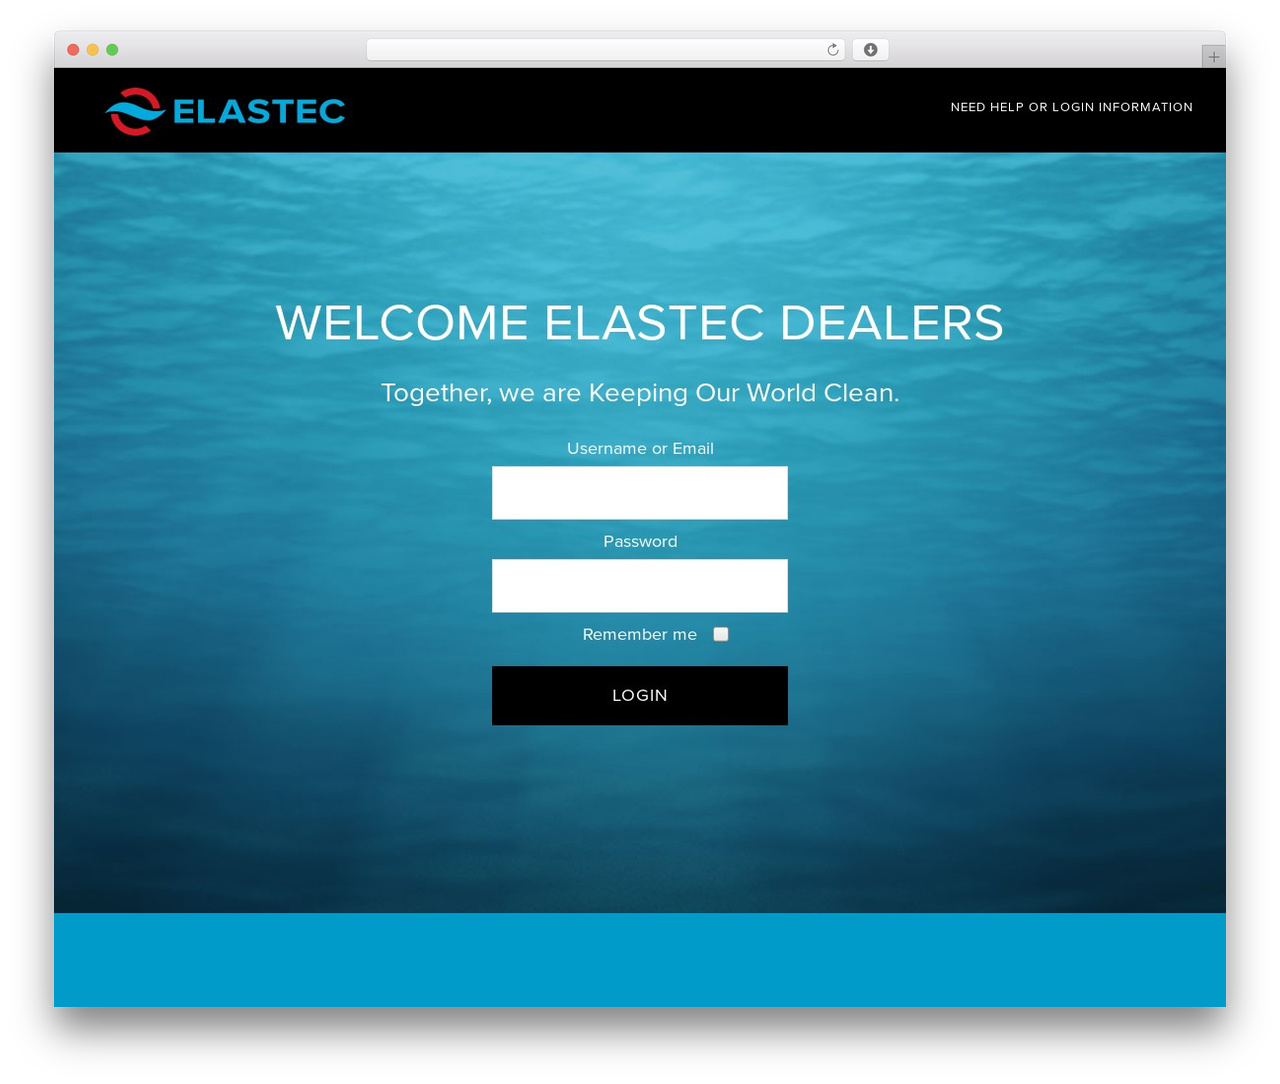 parallax pro theme theme wordpress by studiopress elastecdealer com